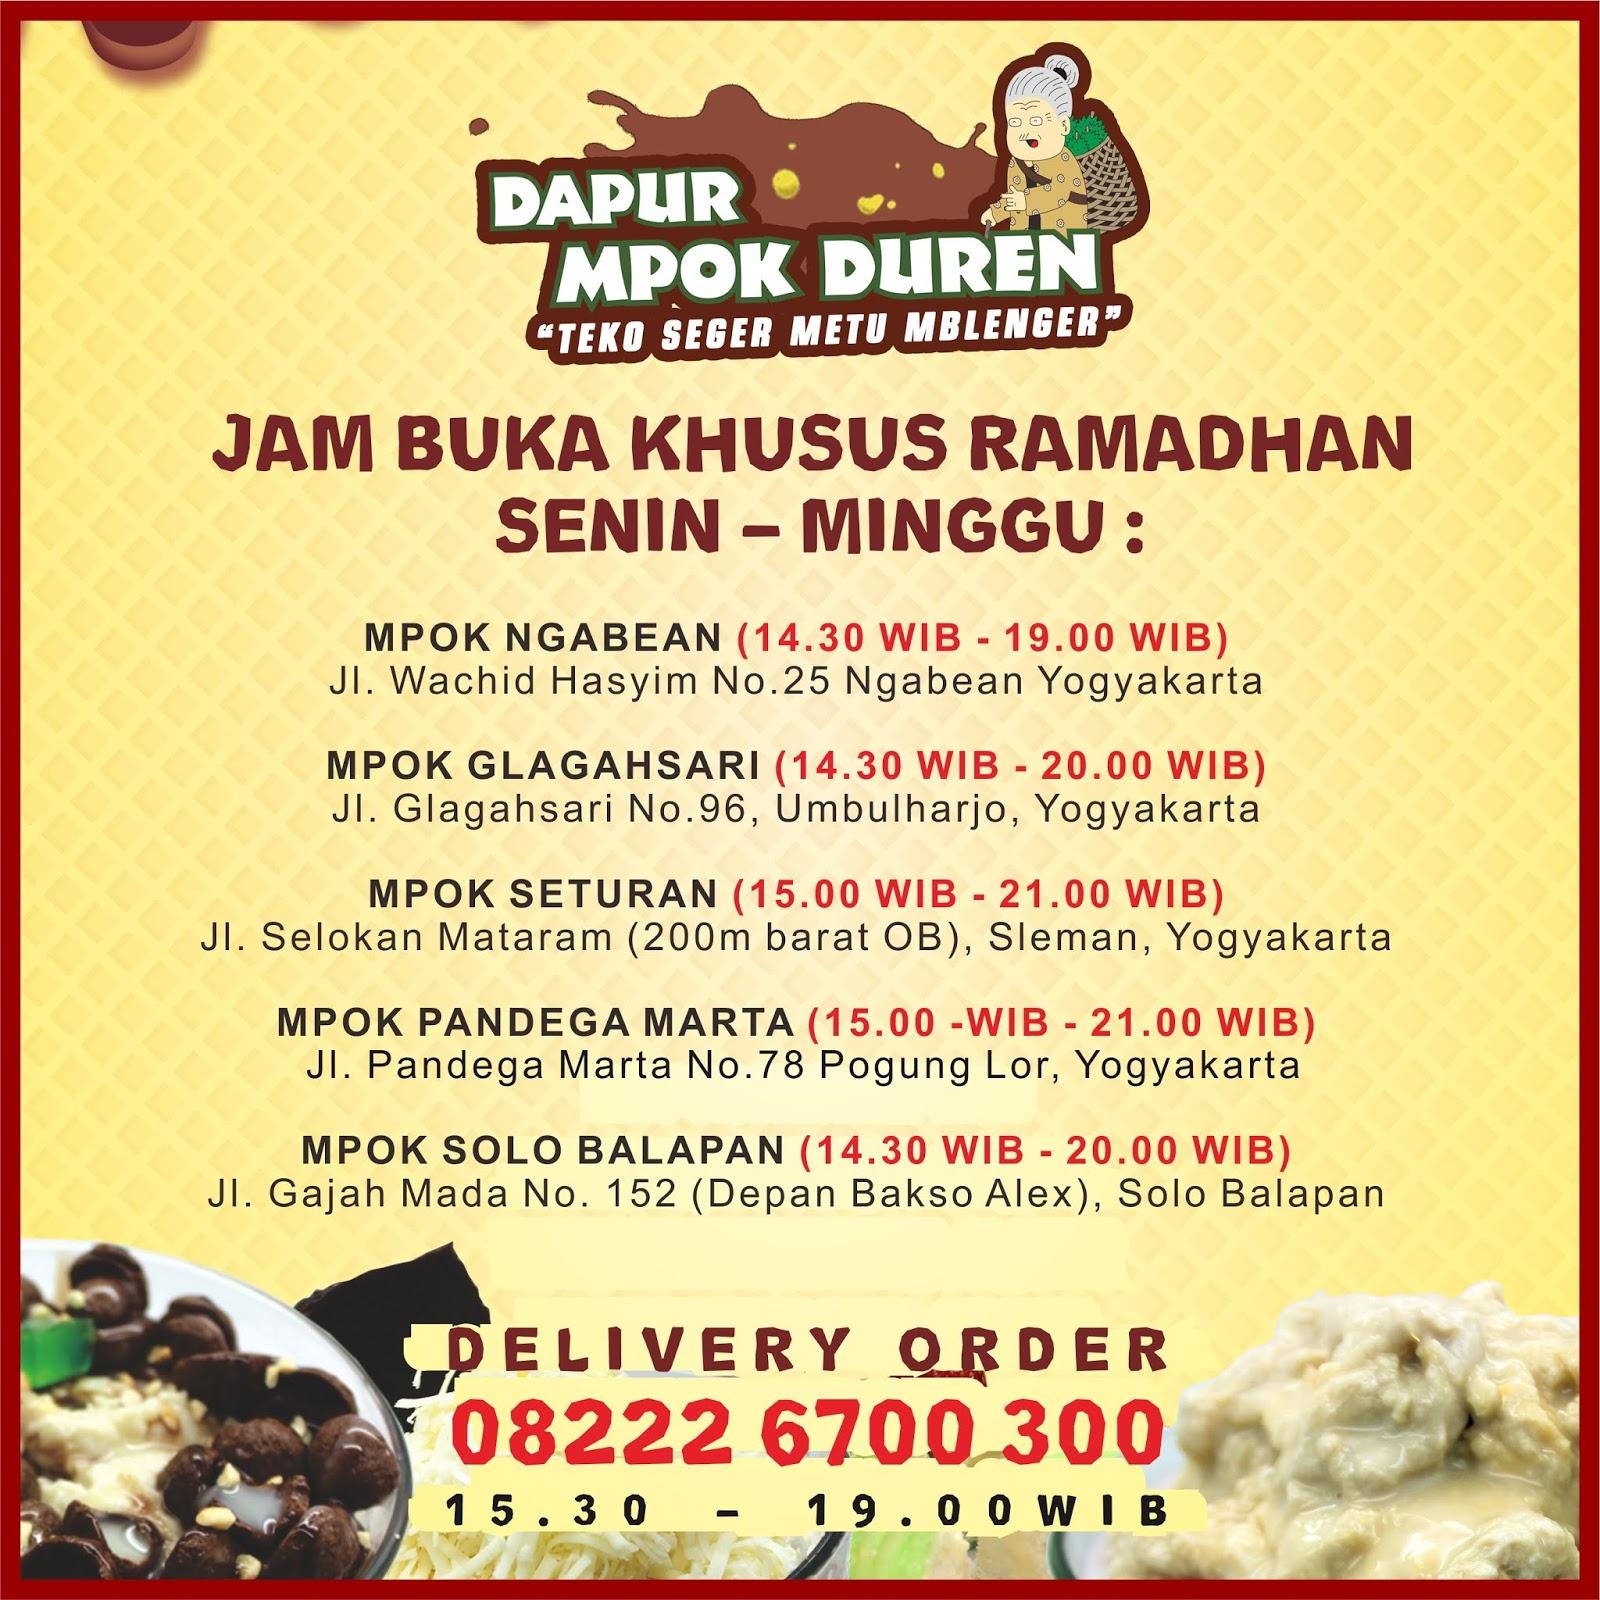 Dapurmpokduren Dapur Mpok Duren Special Ramadhan Jam Buka Khusus